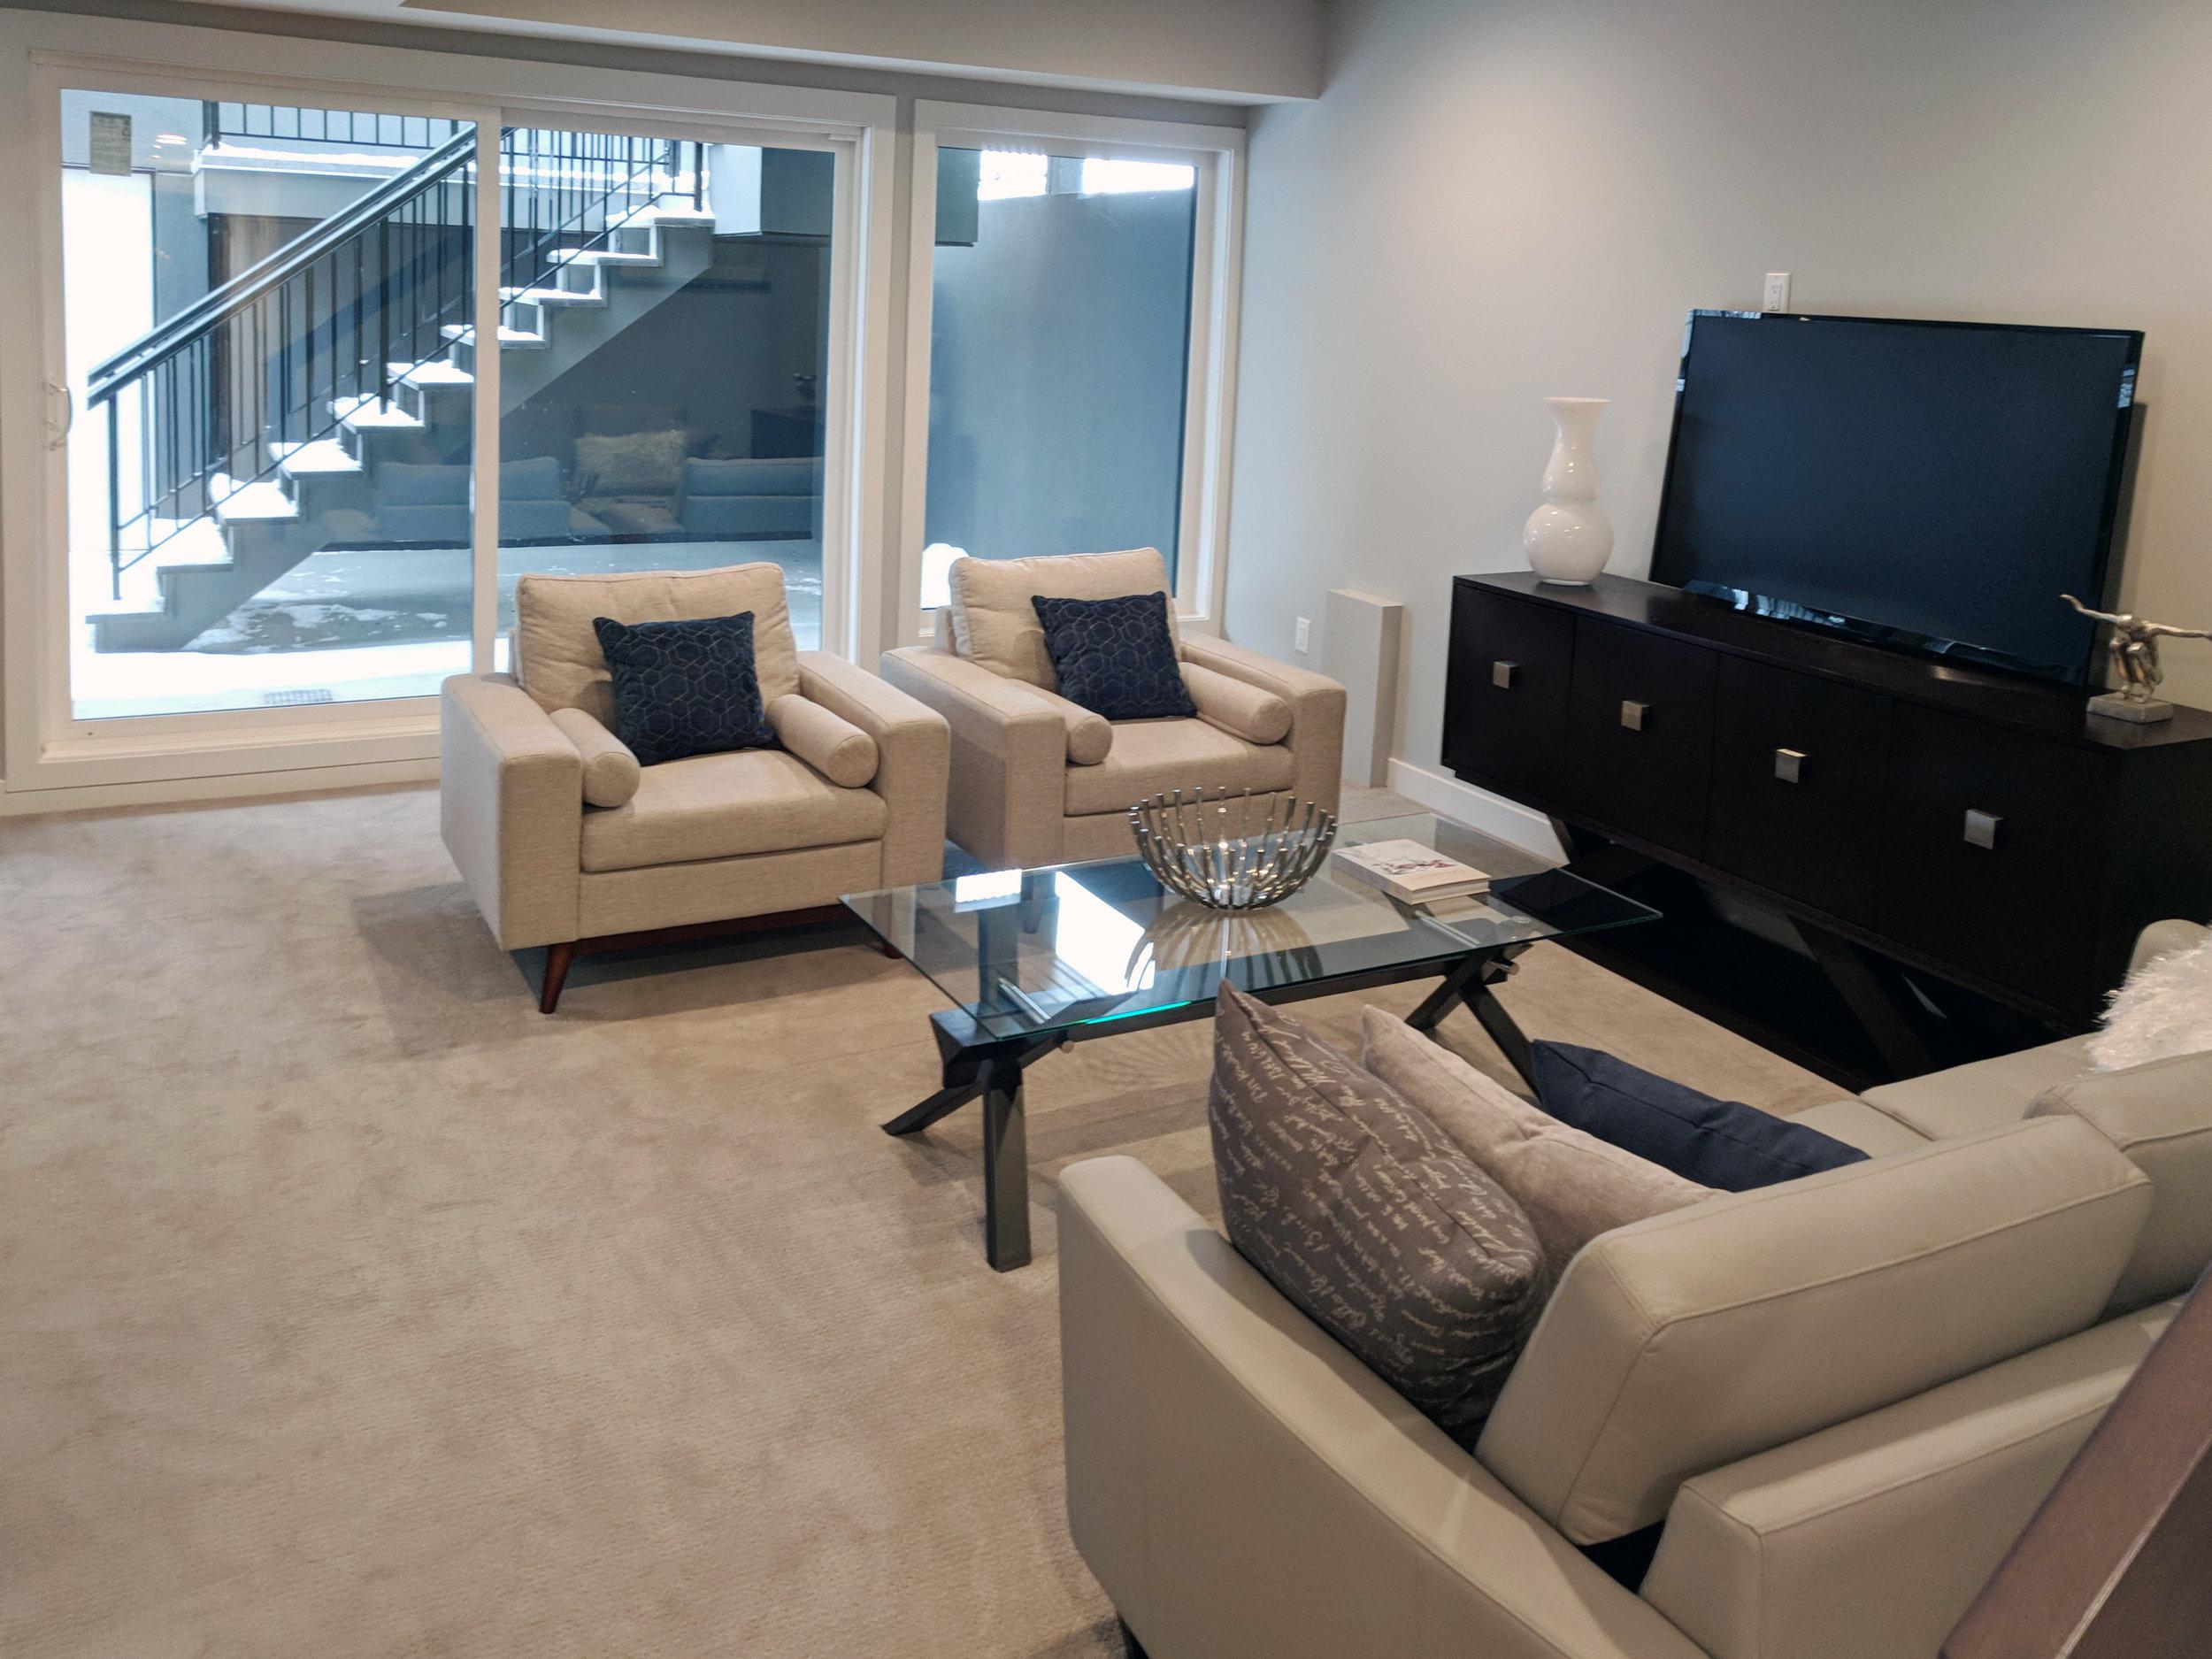 Capilano House - Basement IMG_20190122_122608.jpg